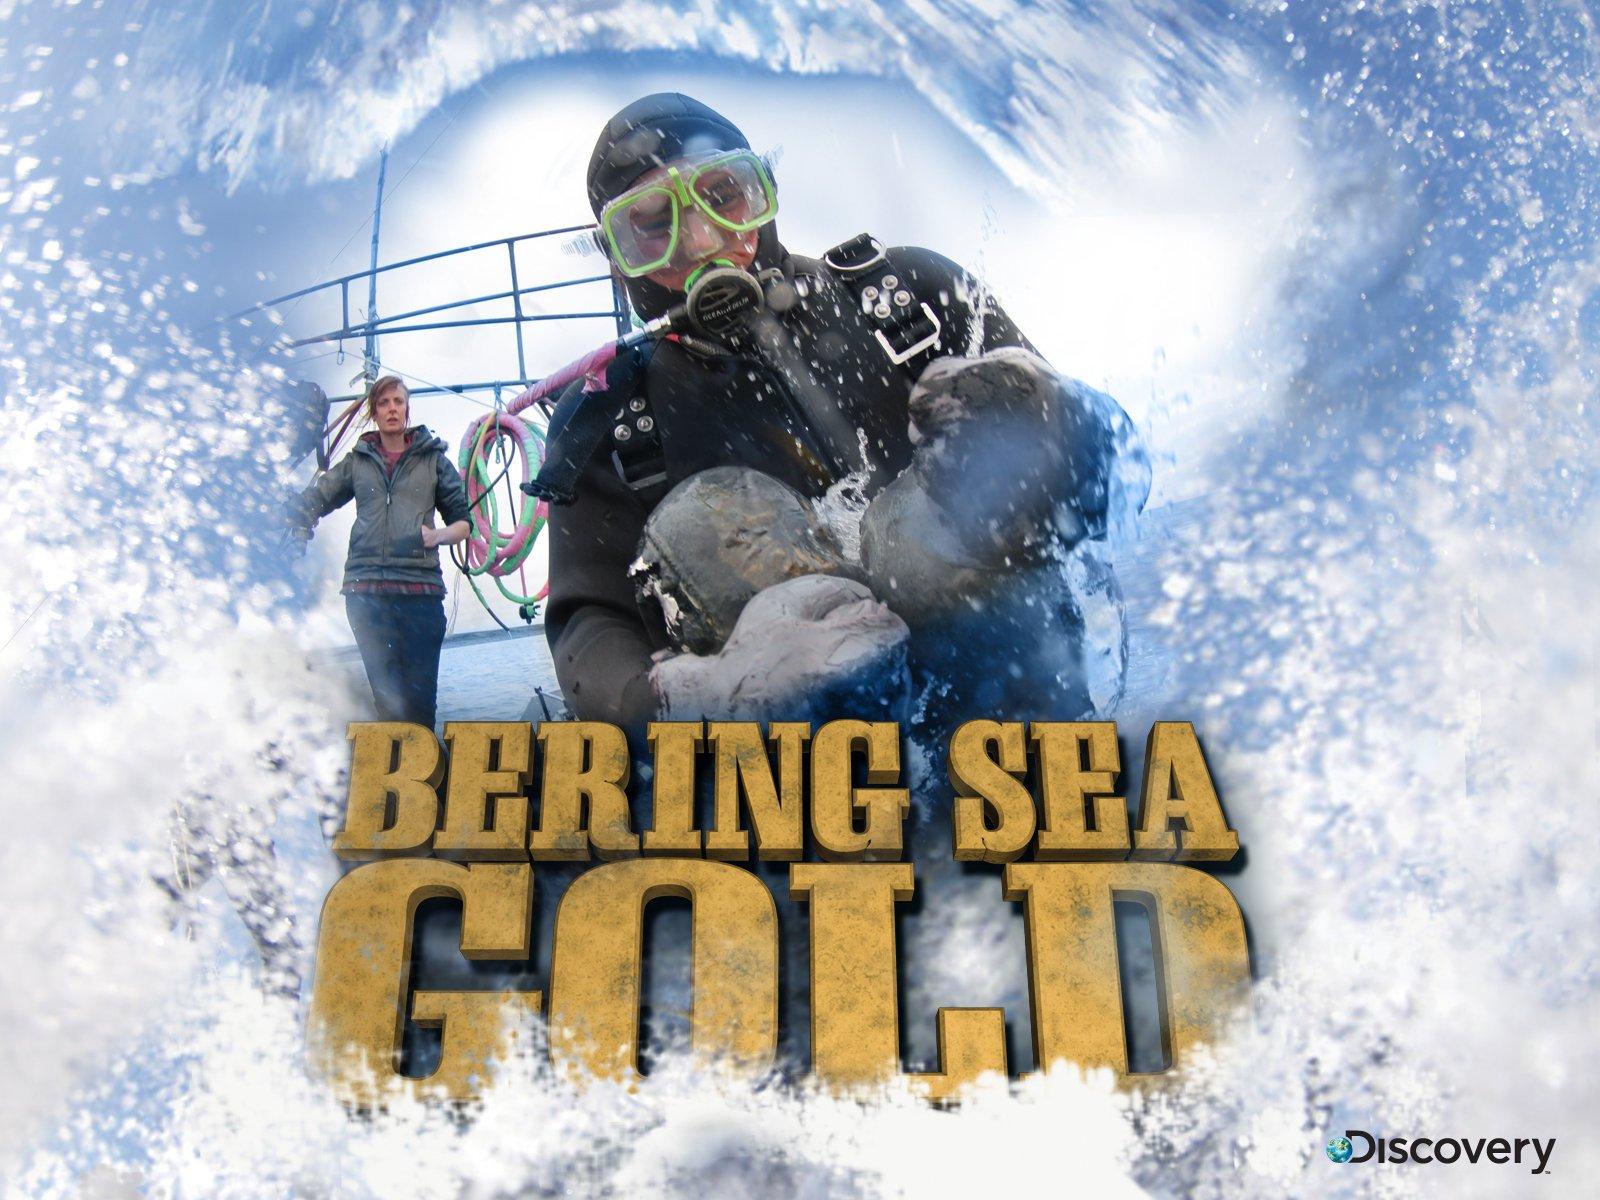 bering sea gold season 10 episode 2